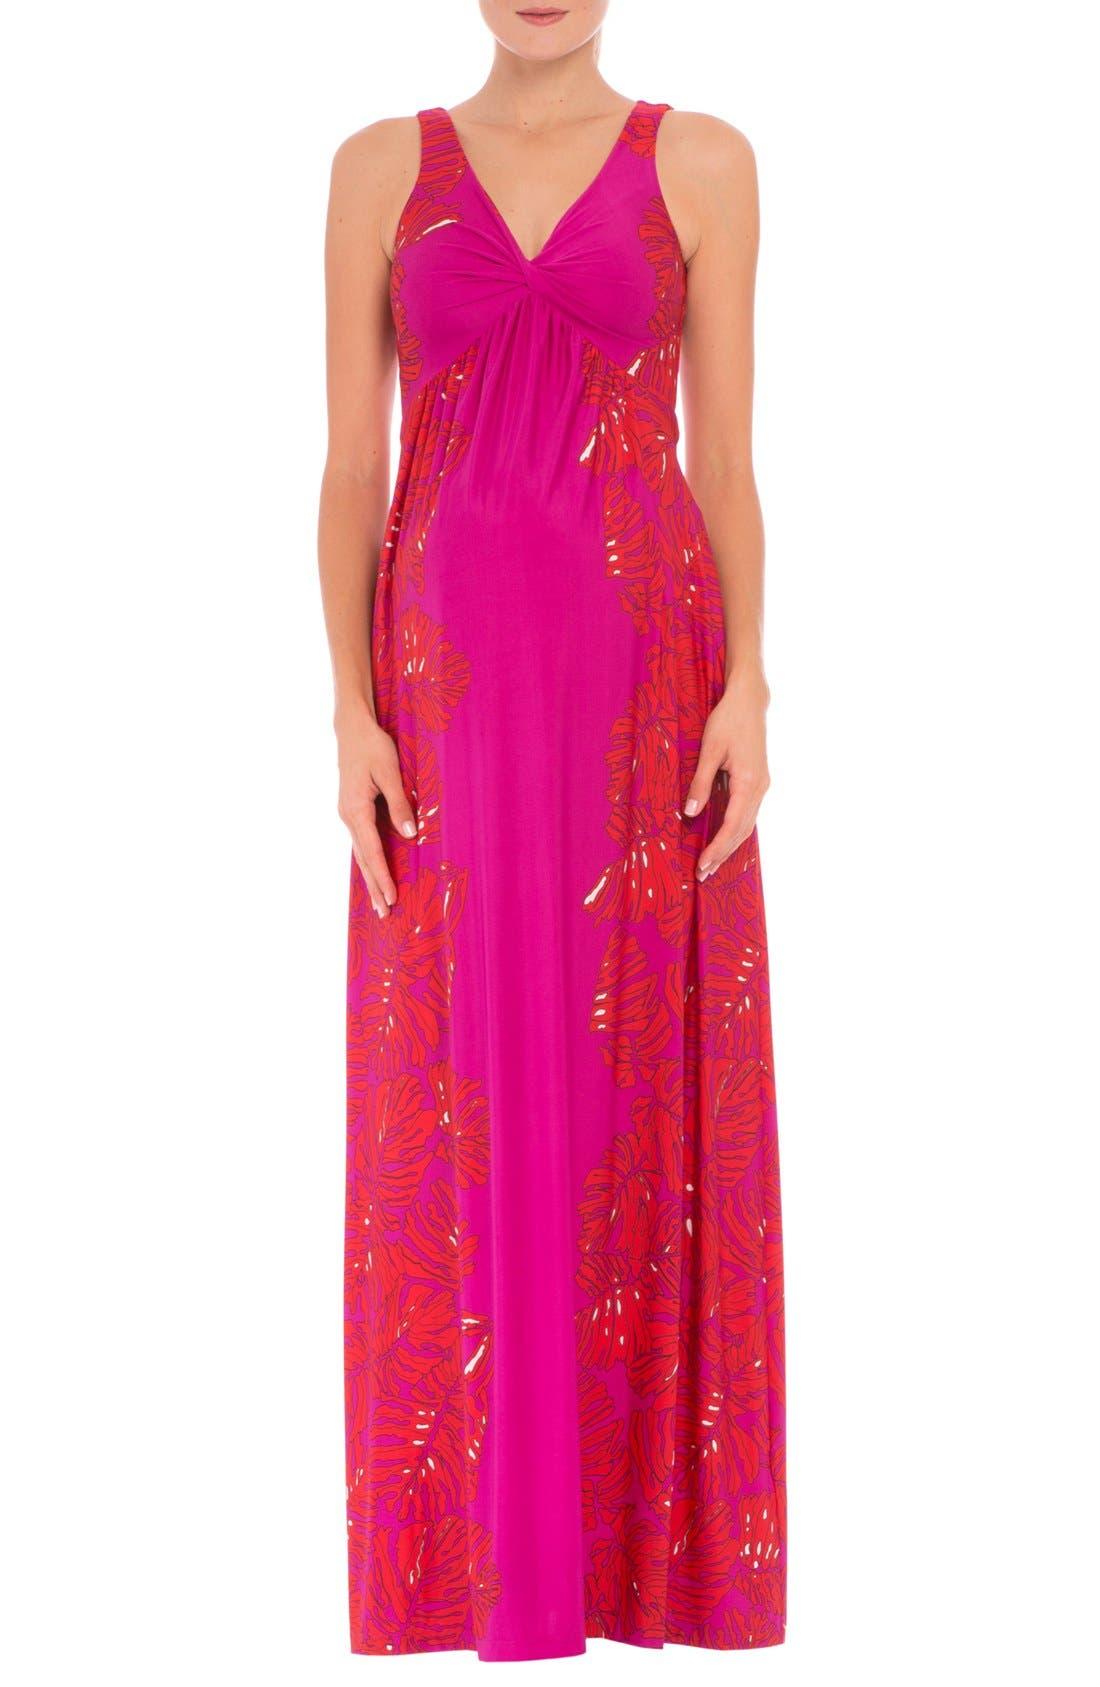 Alternate Image 1 Selected - Olian 'Scarlet' Sleeveless Maternity Maxi Dress